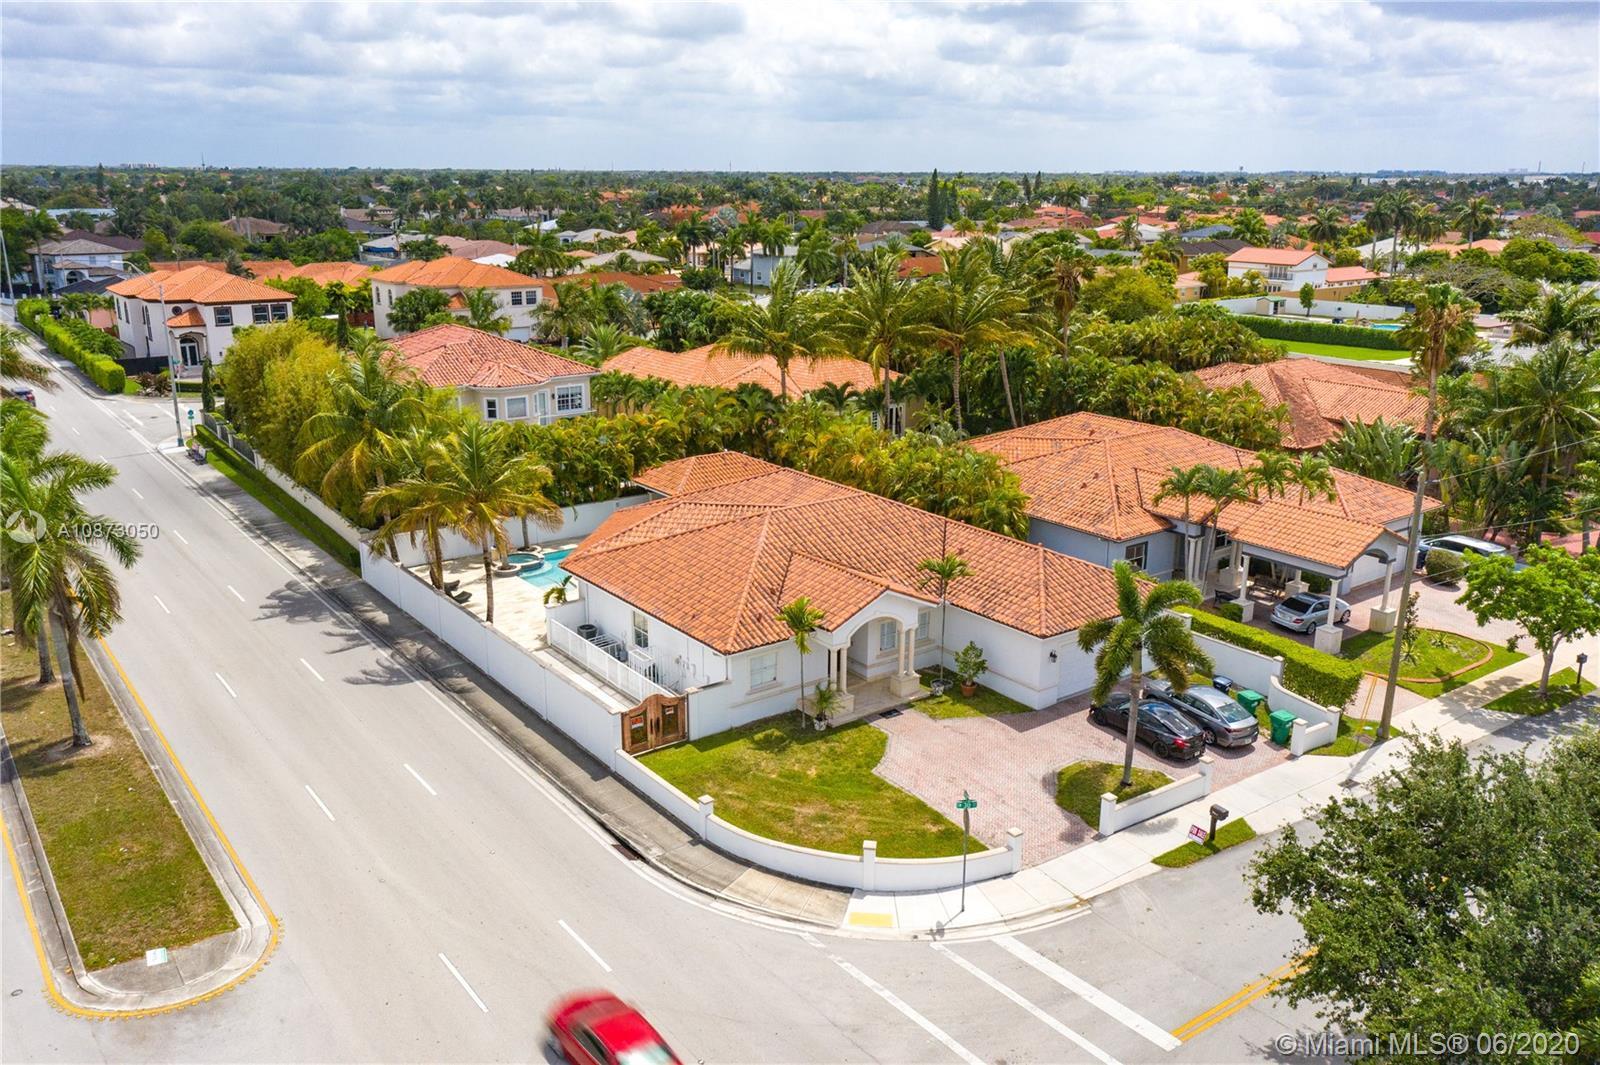 J G Heads Farms - 13700 SW 30th St, Miami, FL 33175